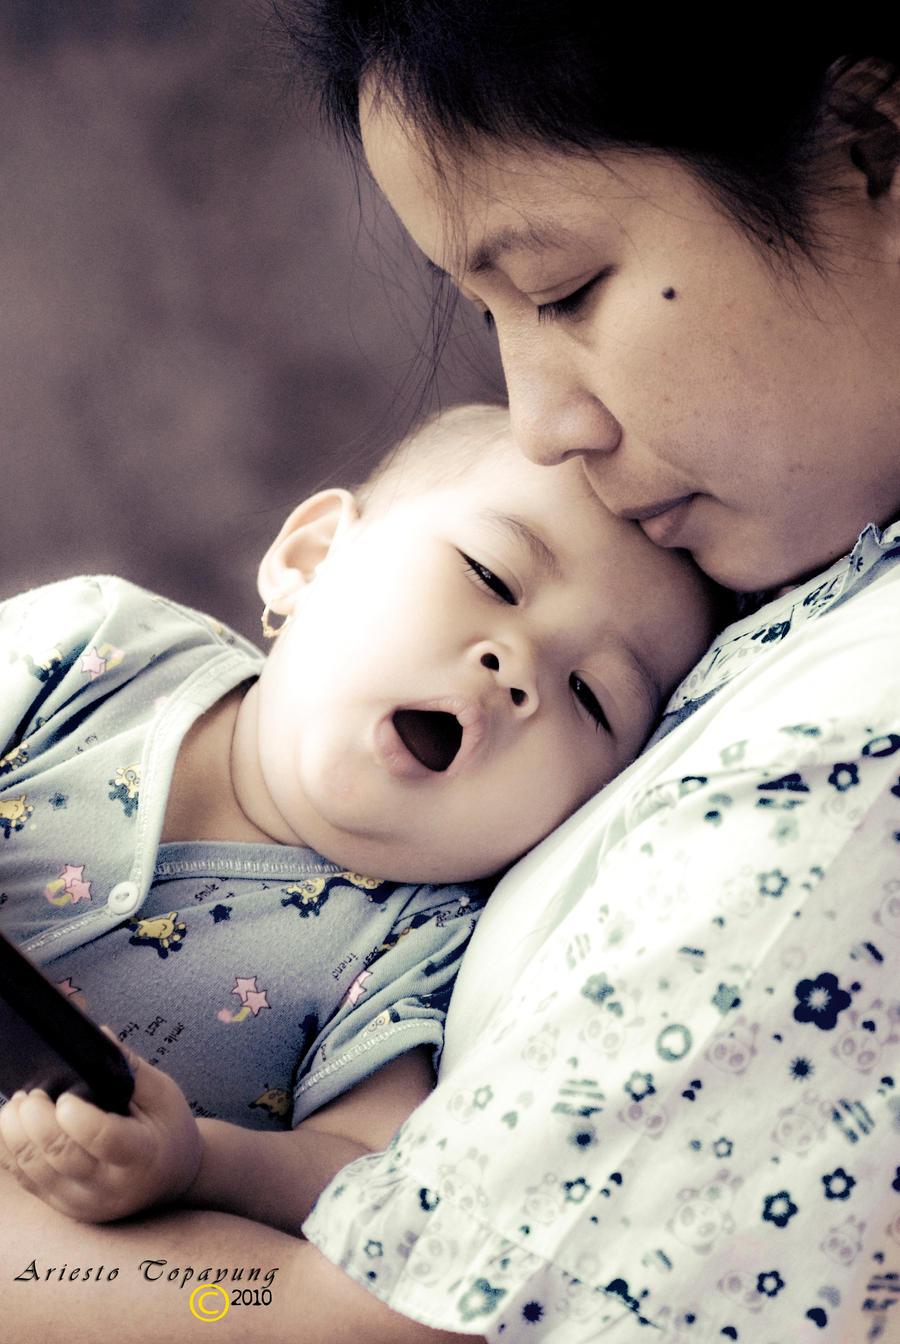 <b>Kasih Ibu</b> kepada Beta by Lasoanto <b>Kasih Ibu</b> kepada Beta by Lasoanto - kasih_ibu_kepada_beta_by_lasoanto-d35dime